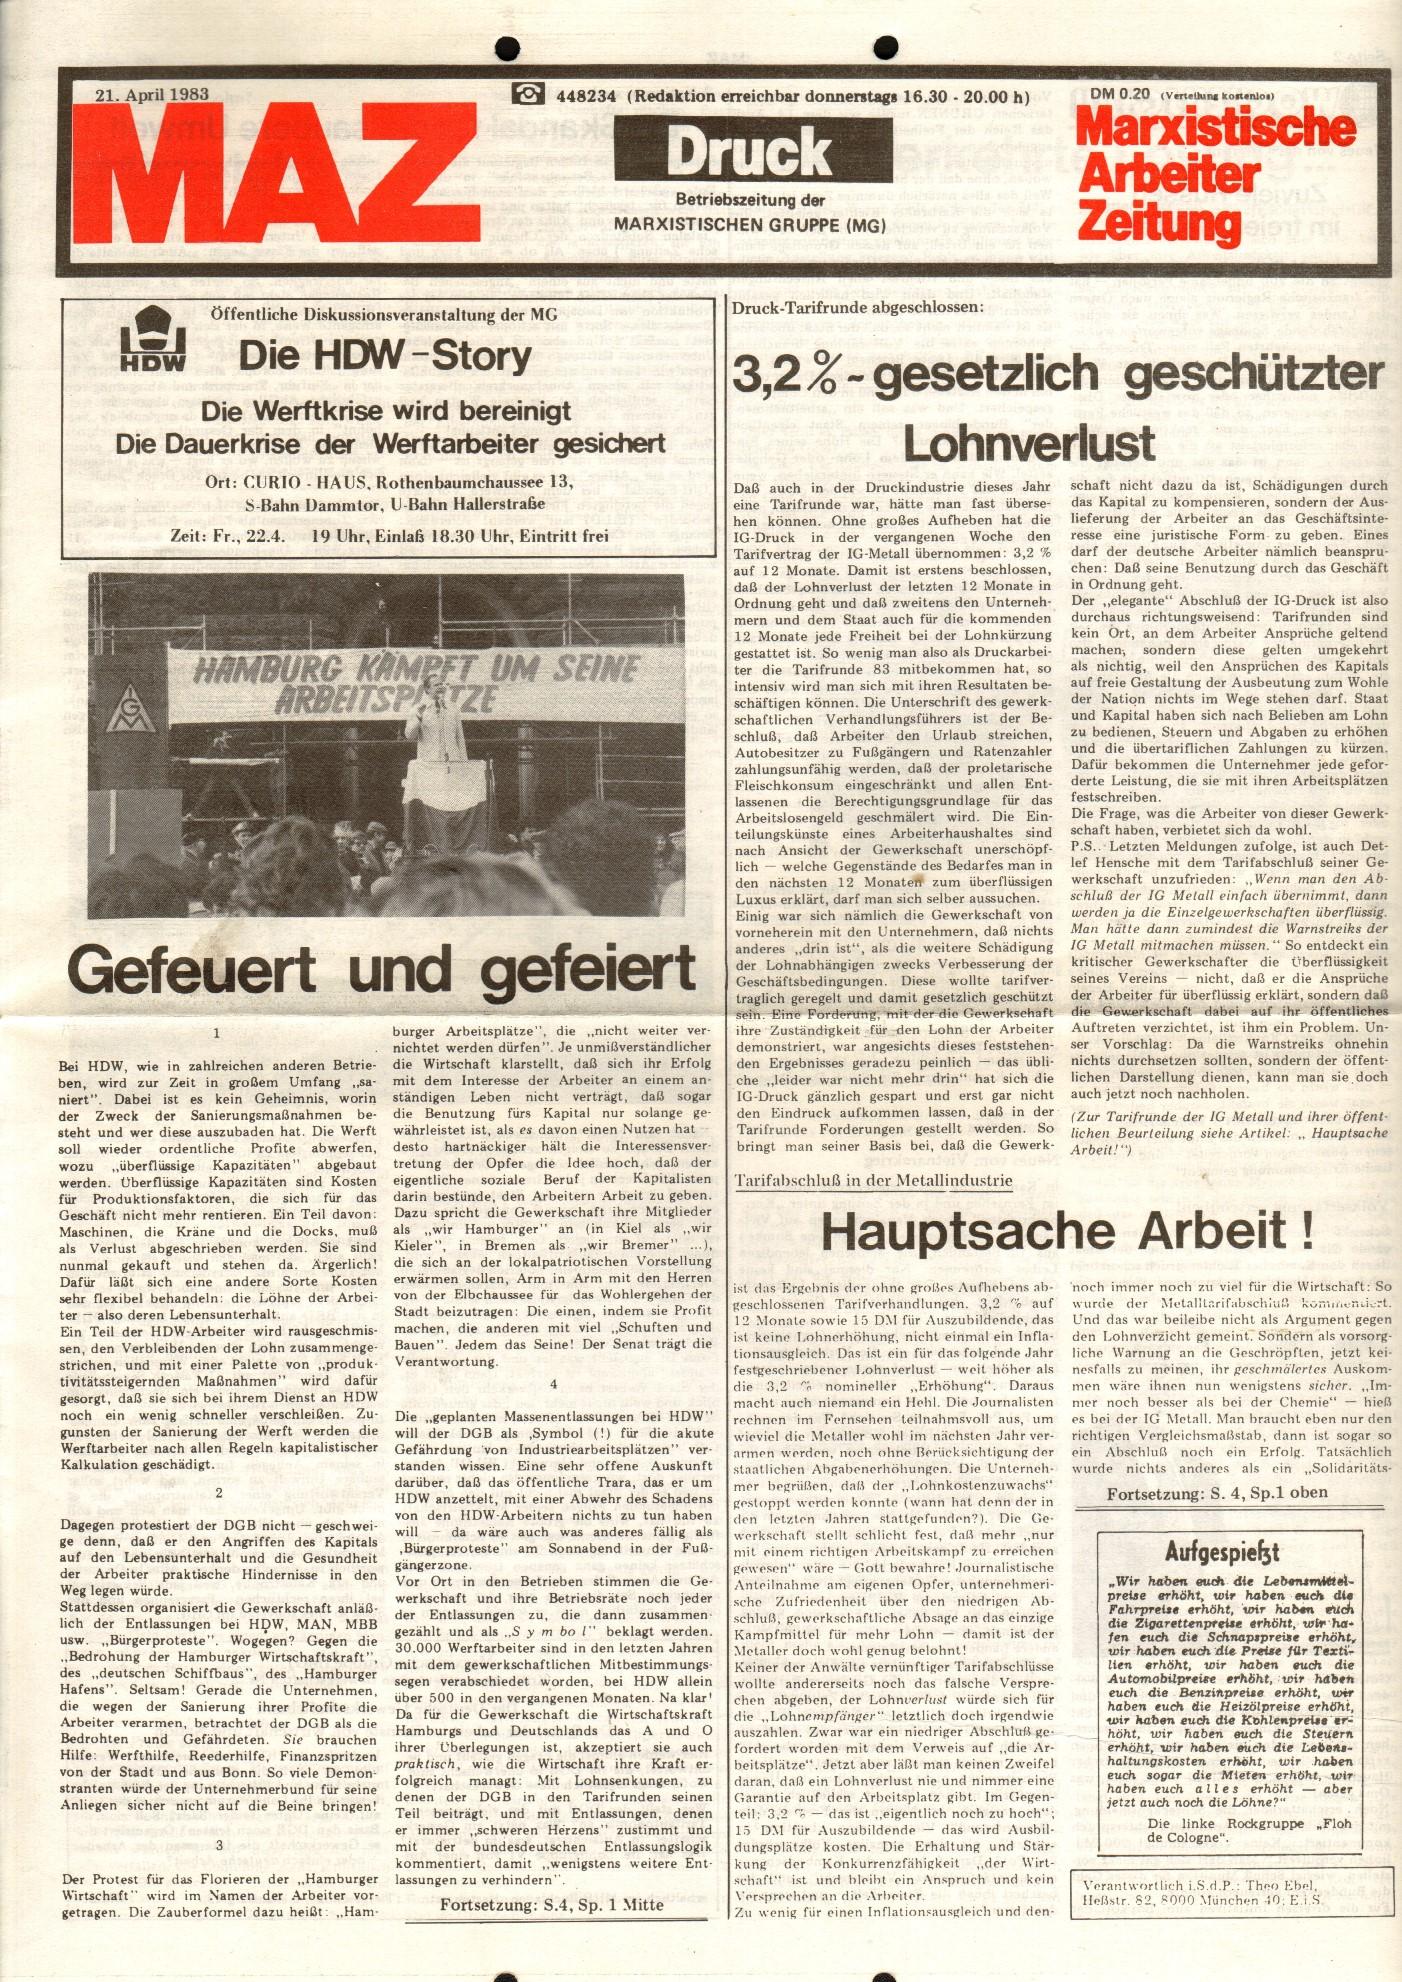 Hamburg_MG_MAZ_Druck_19830421_01